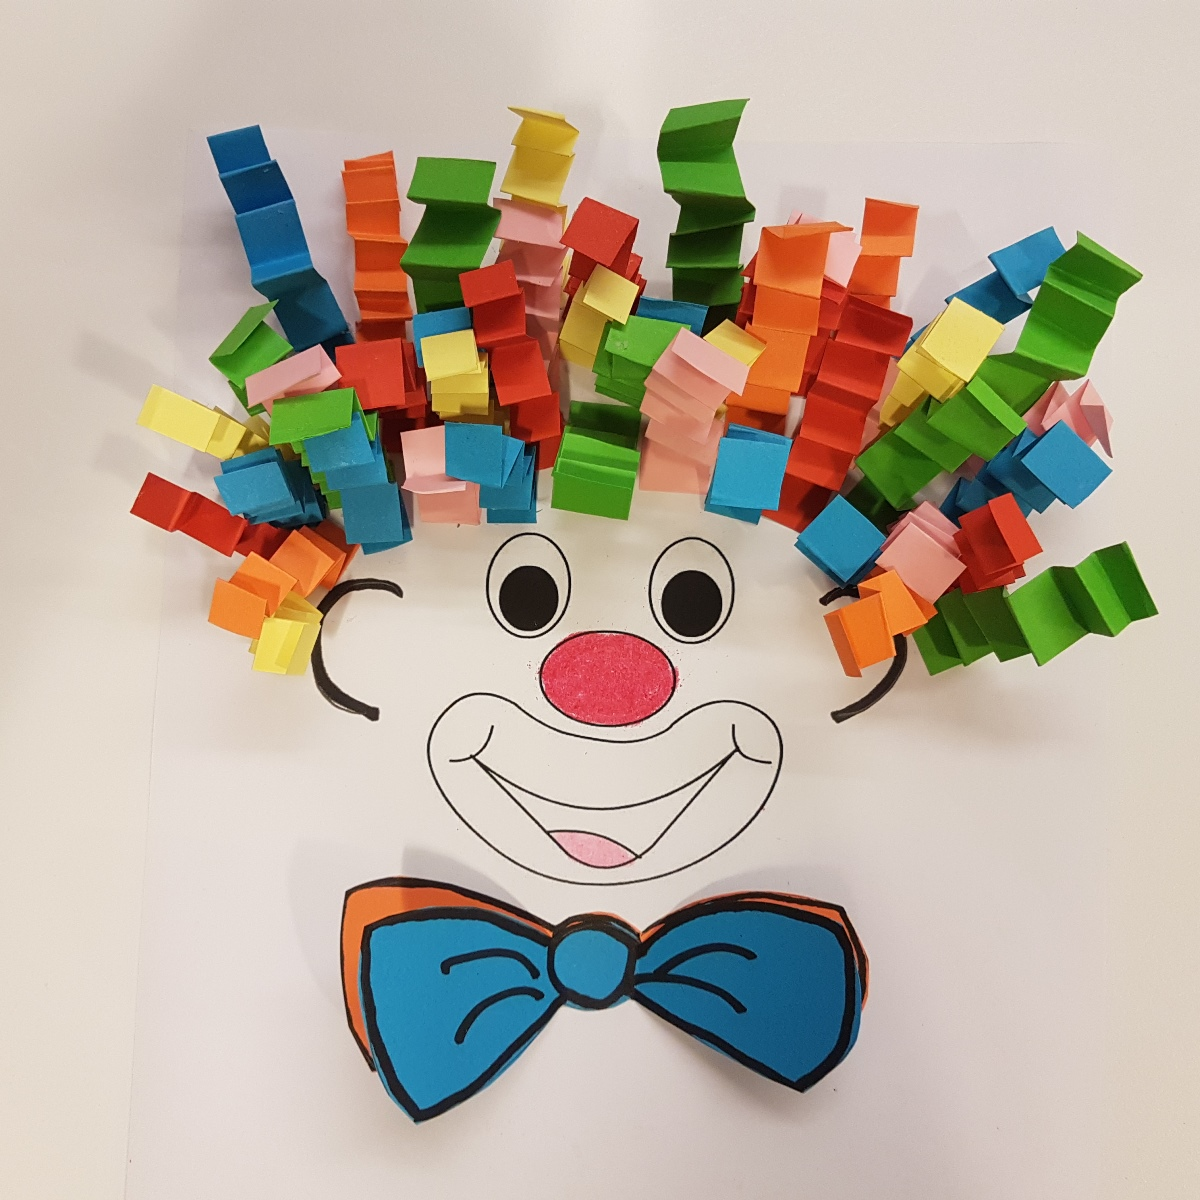 Party clown, carnevale a tutta creatività!